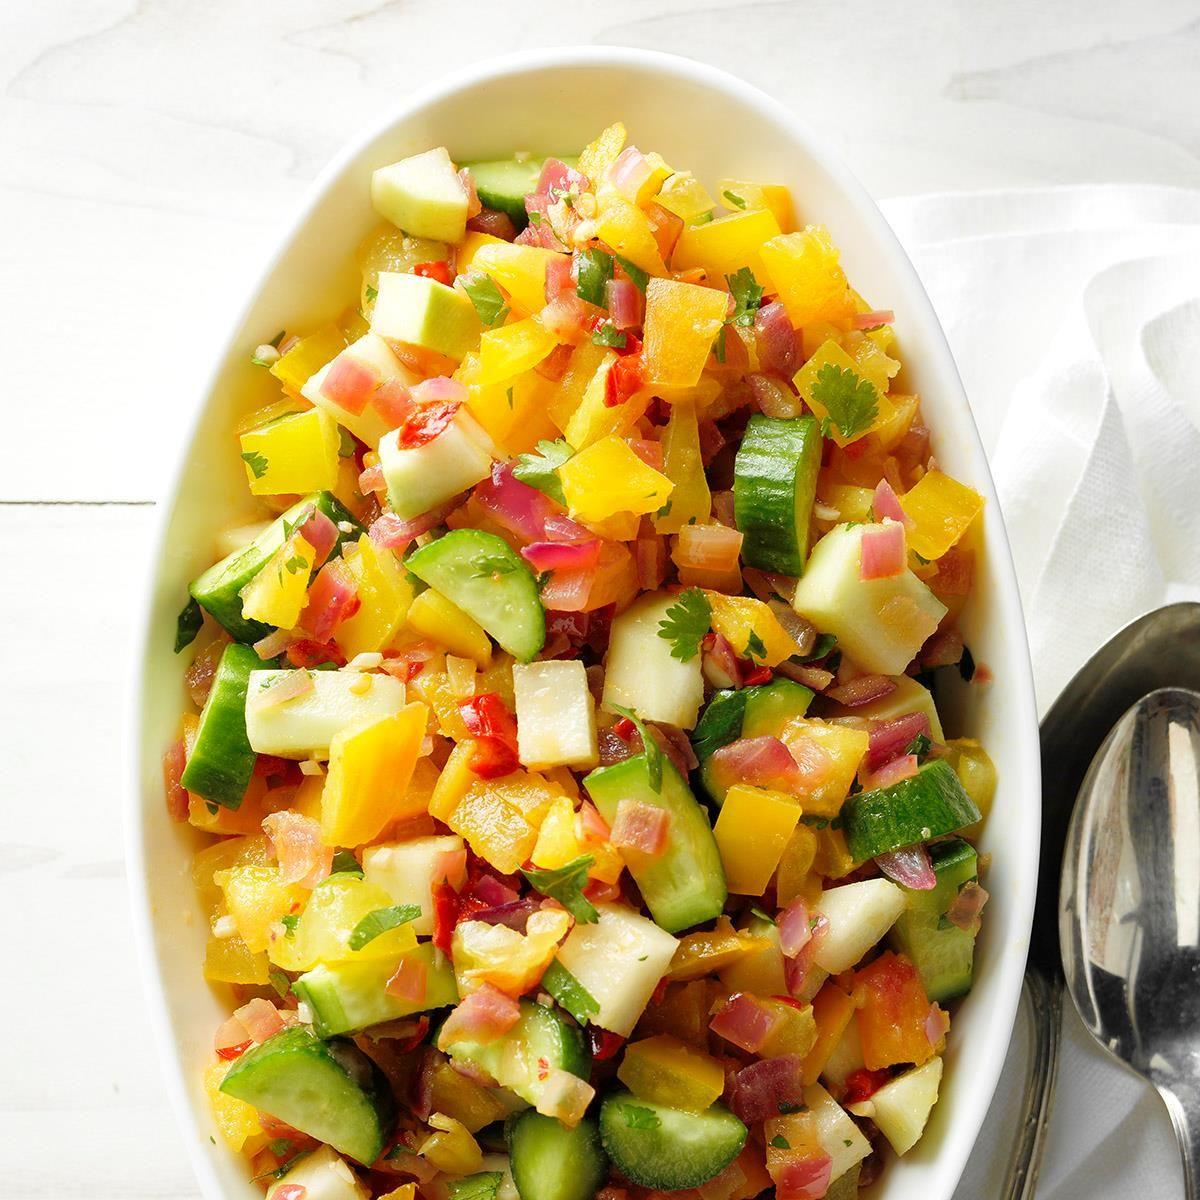 Kohlrabi Cucumber And Tomato Salad